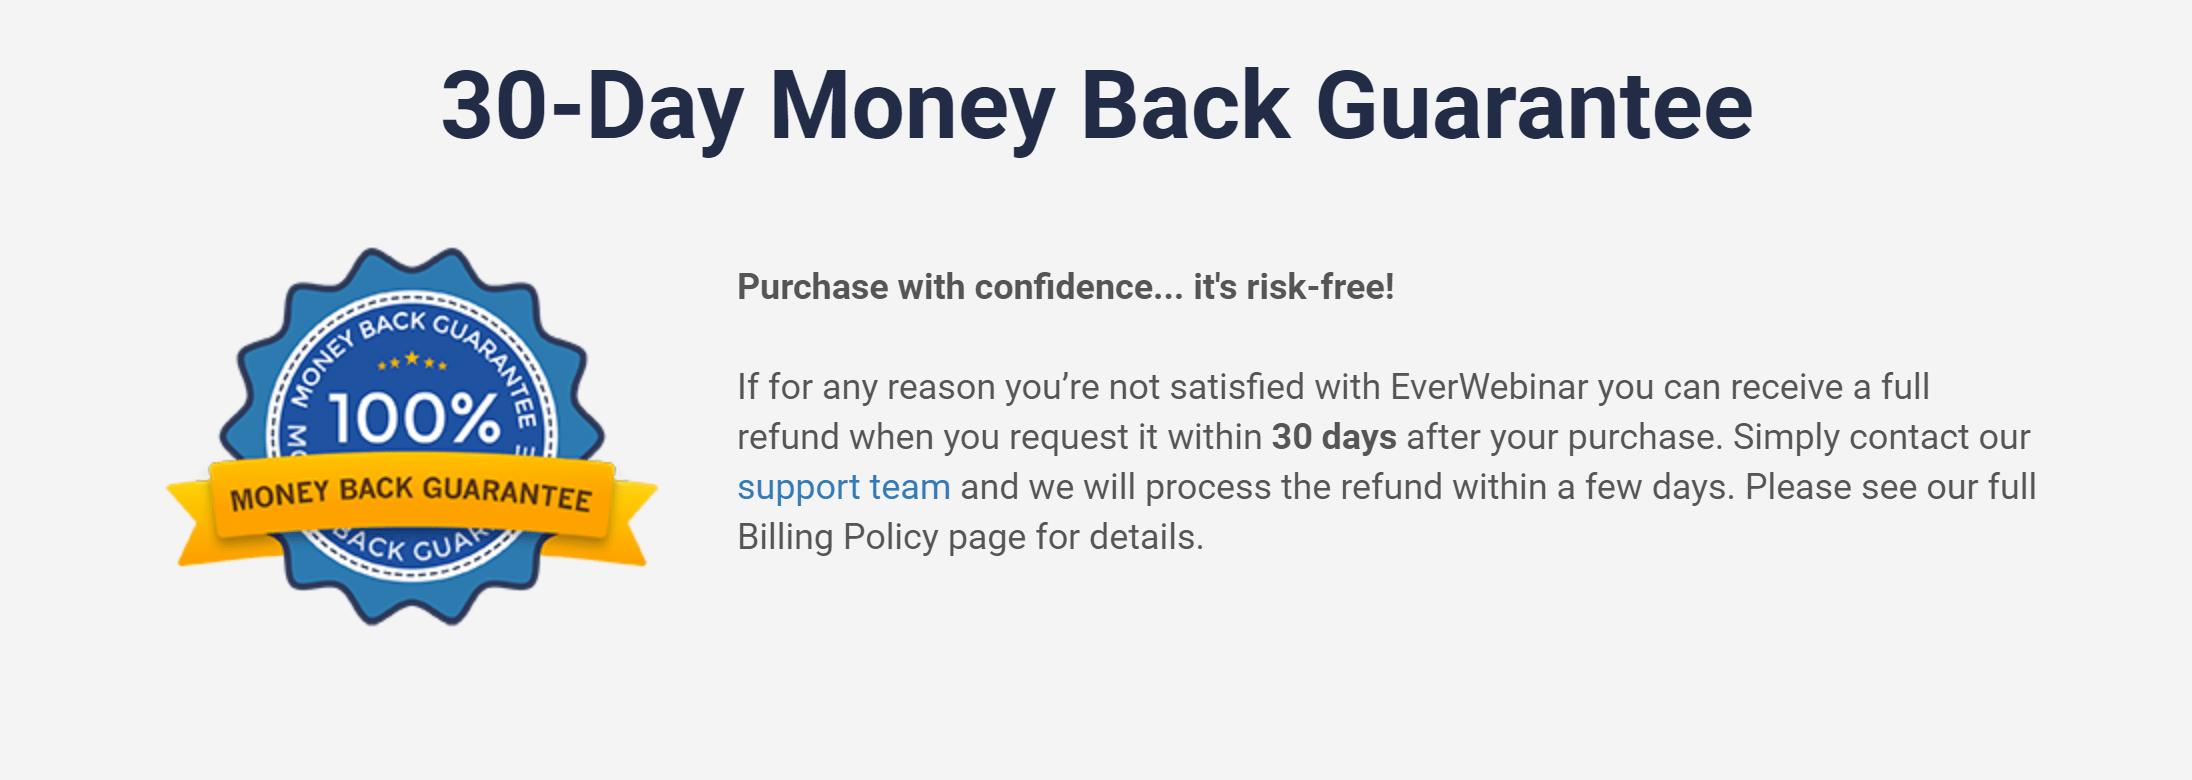 Everwebinar money back guarantee